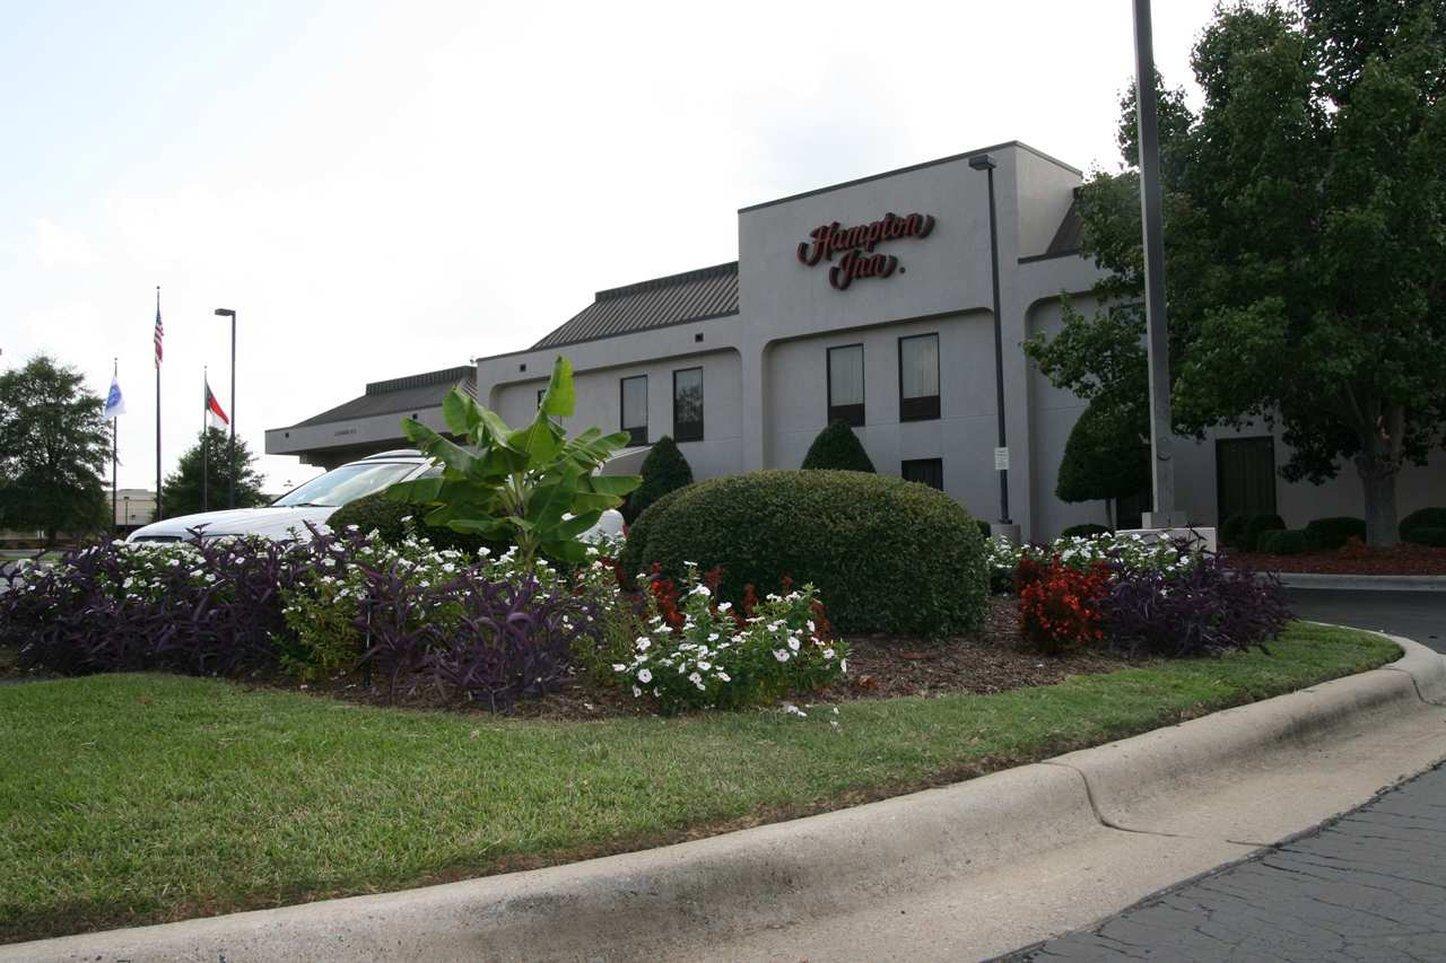 Hampton Inn Lumberton-I-95